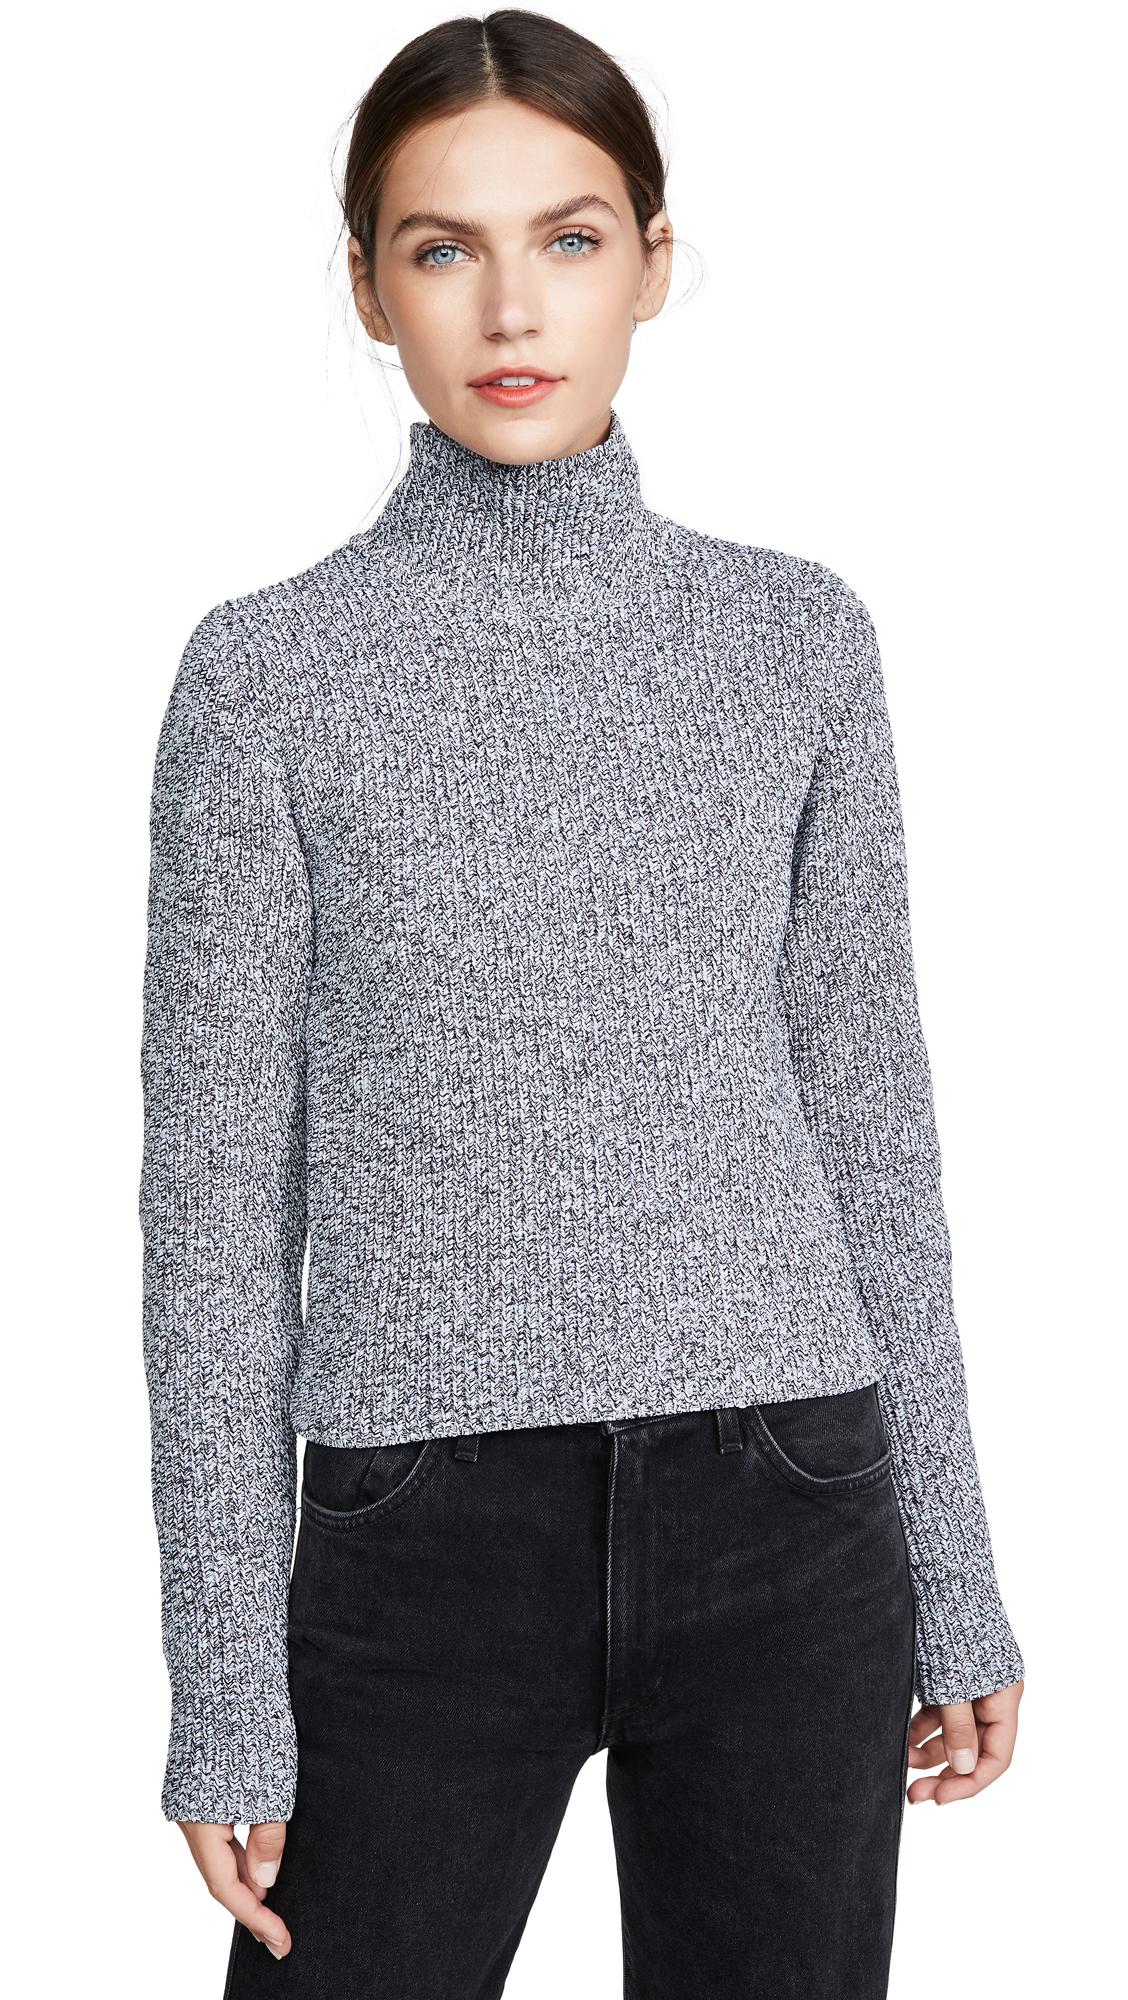 Tibi Zip-Through High-Neck Ribbed Sweater In Black/White Multi